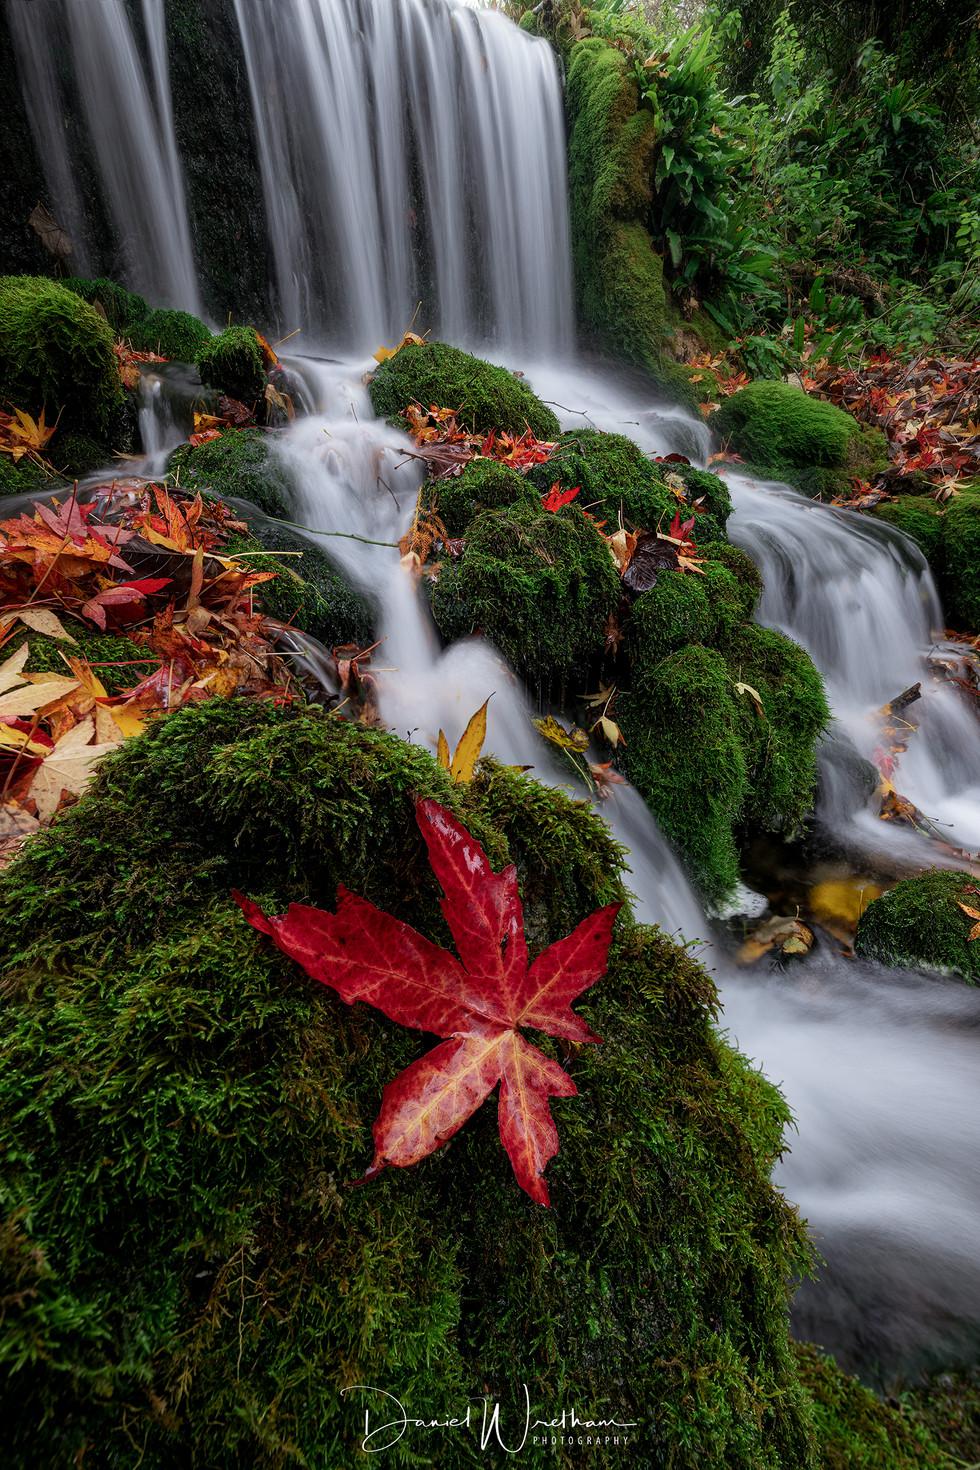 Autumn at Littlebredy